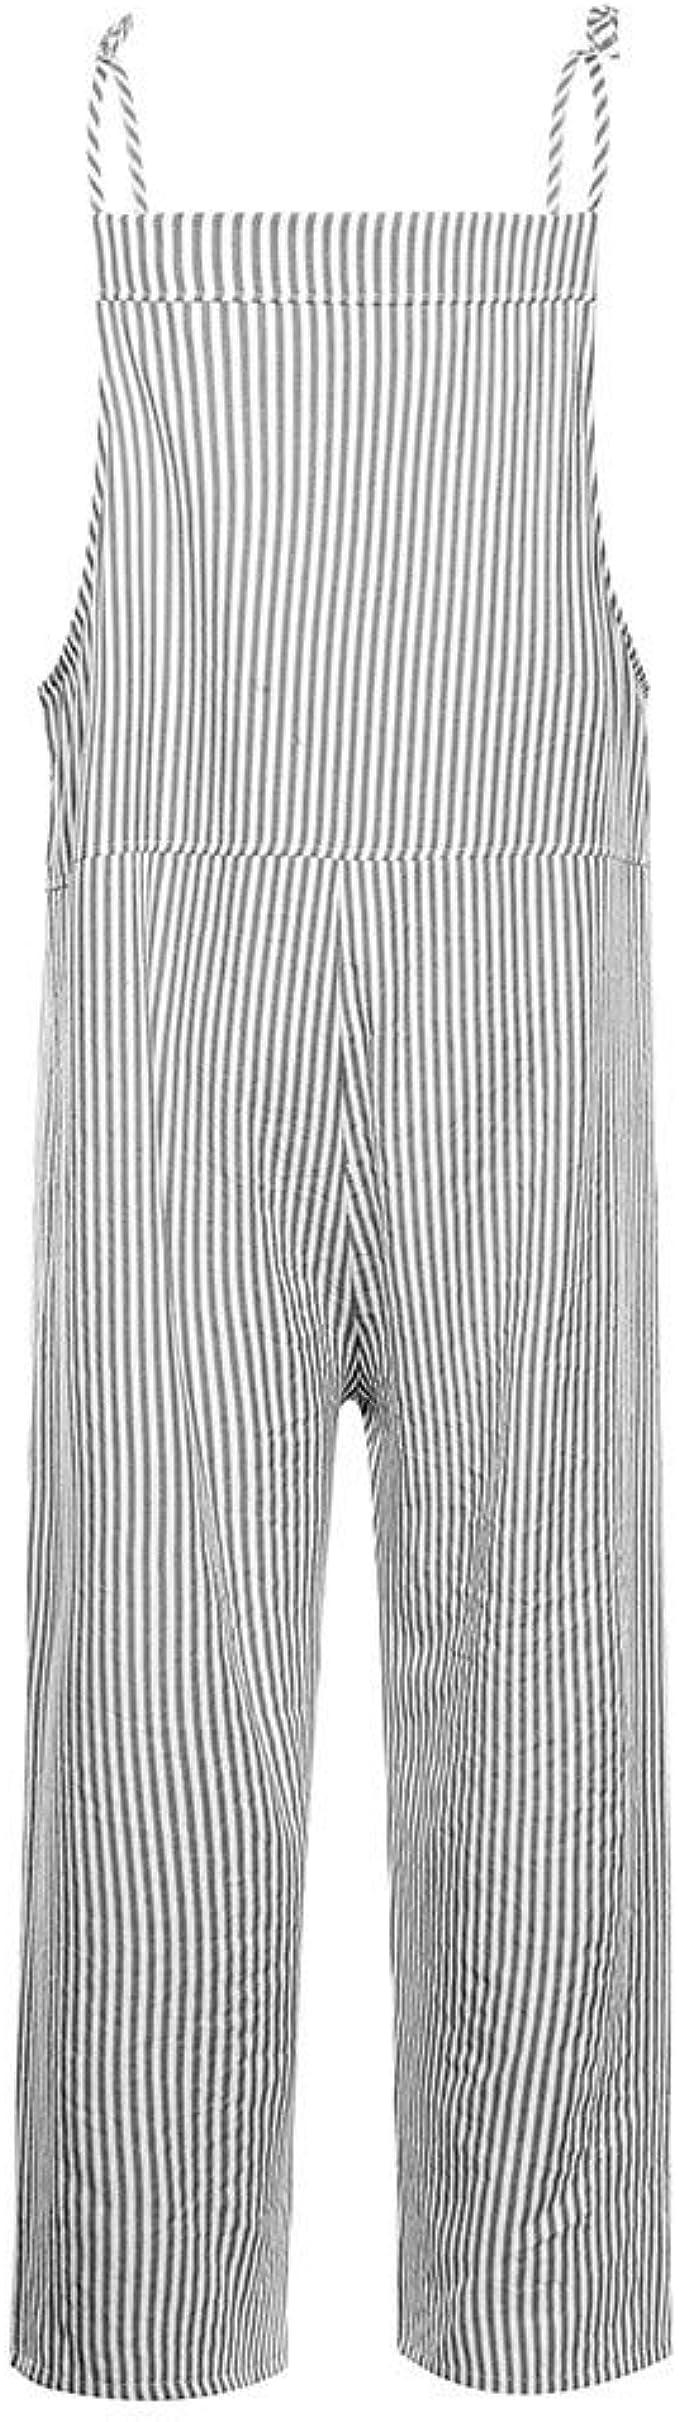 PARVAL Mujer Jumpsuit Retro de Mujer Raya Babero Overol Bolsillos Vendaje Mono sin Mangas Body Romper Casual Largo Harem Playsuit Pantalones Pantalones Overoles